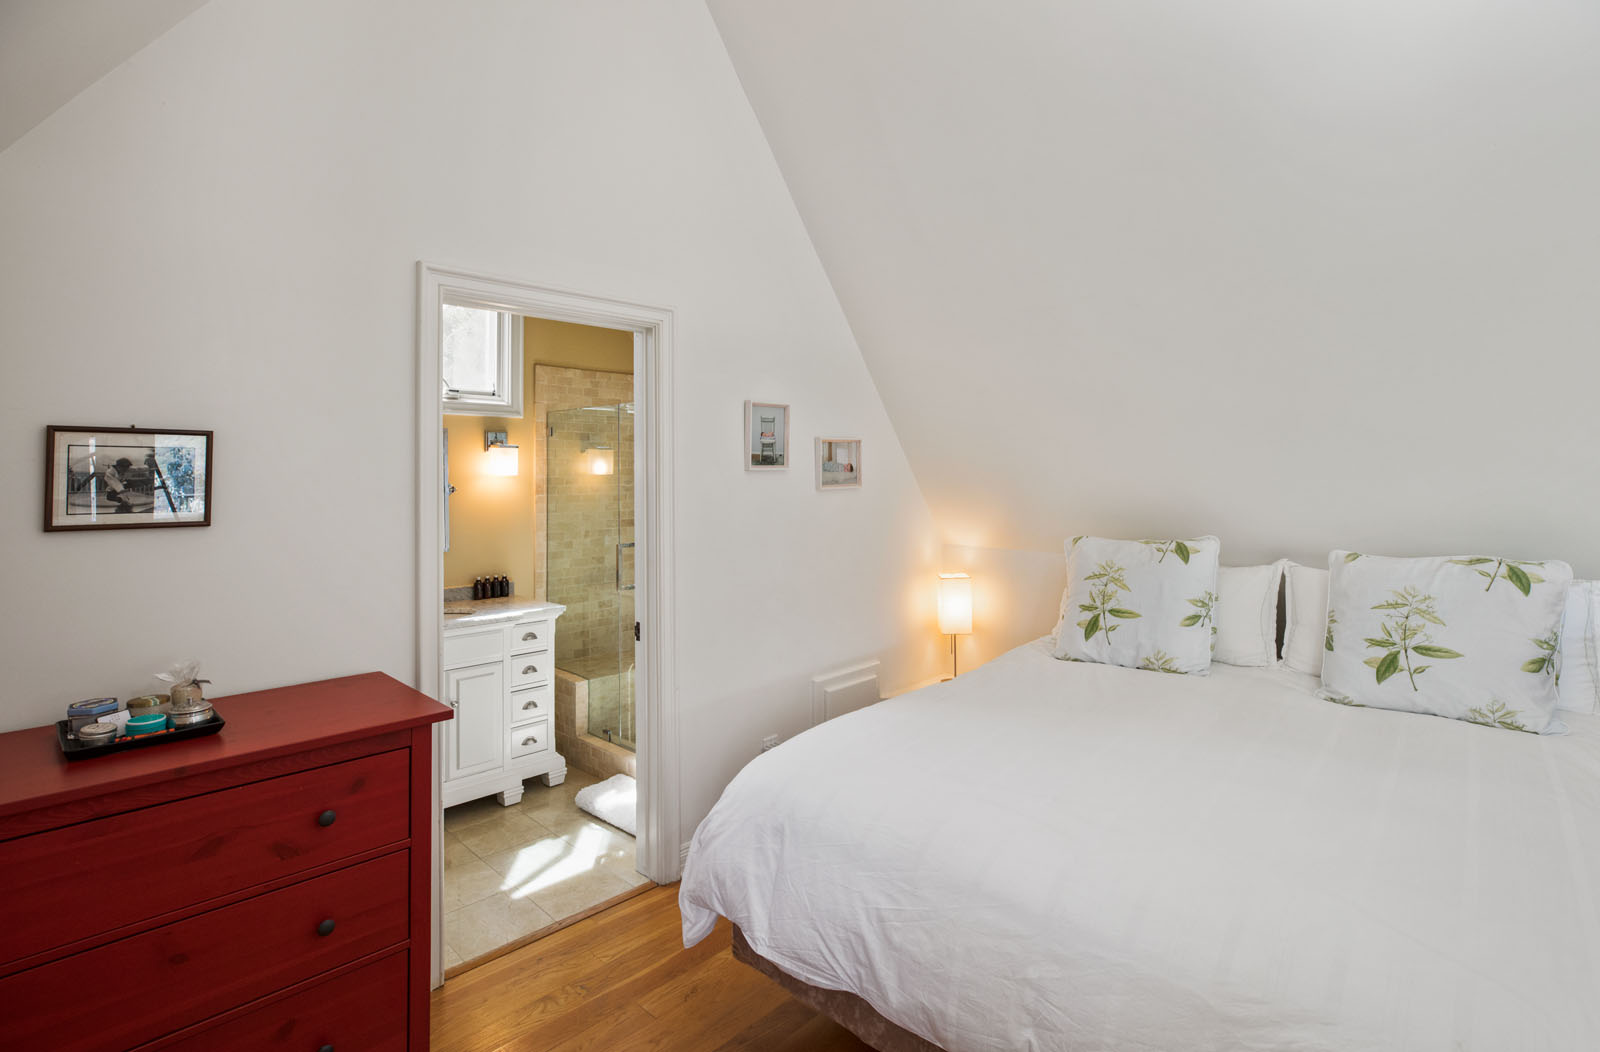 027 Loft Bedroom 1712 Manzanita Park Avenue Malibu For Sale Lease The Malibu Life Team Luxury Real Estate.jpg